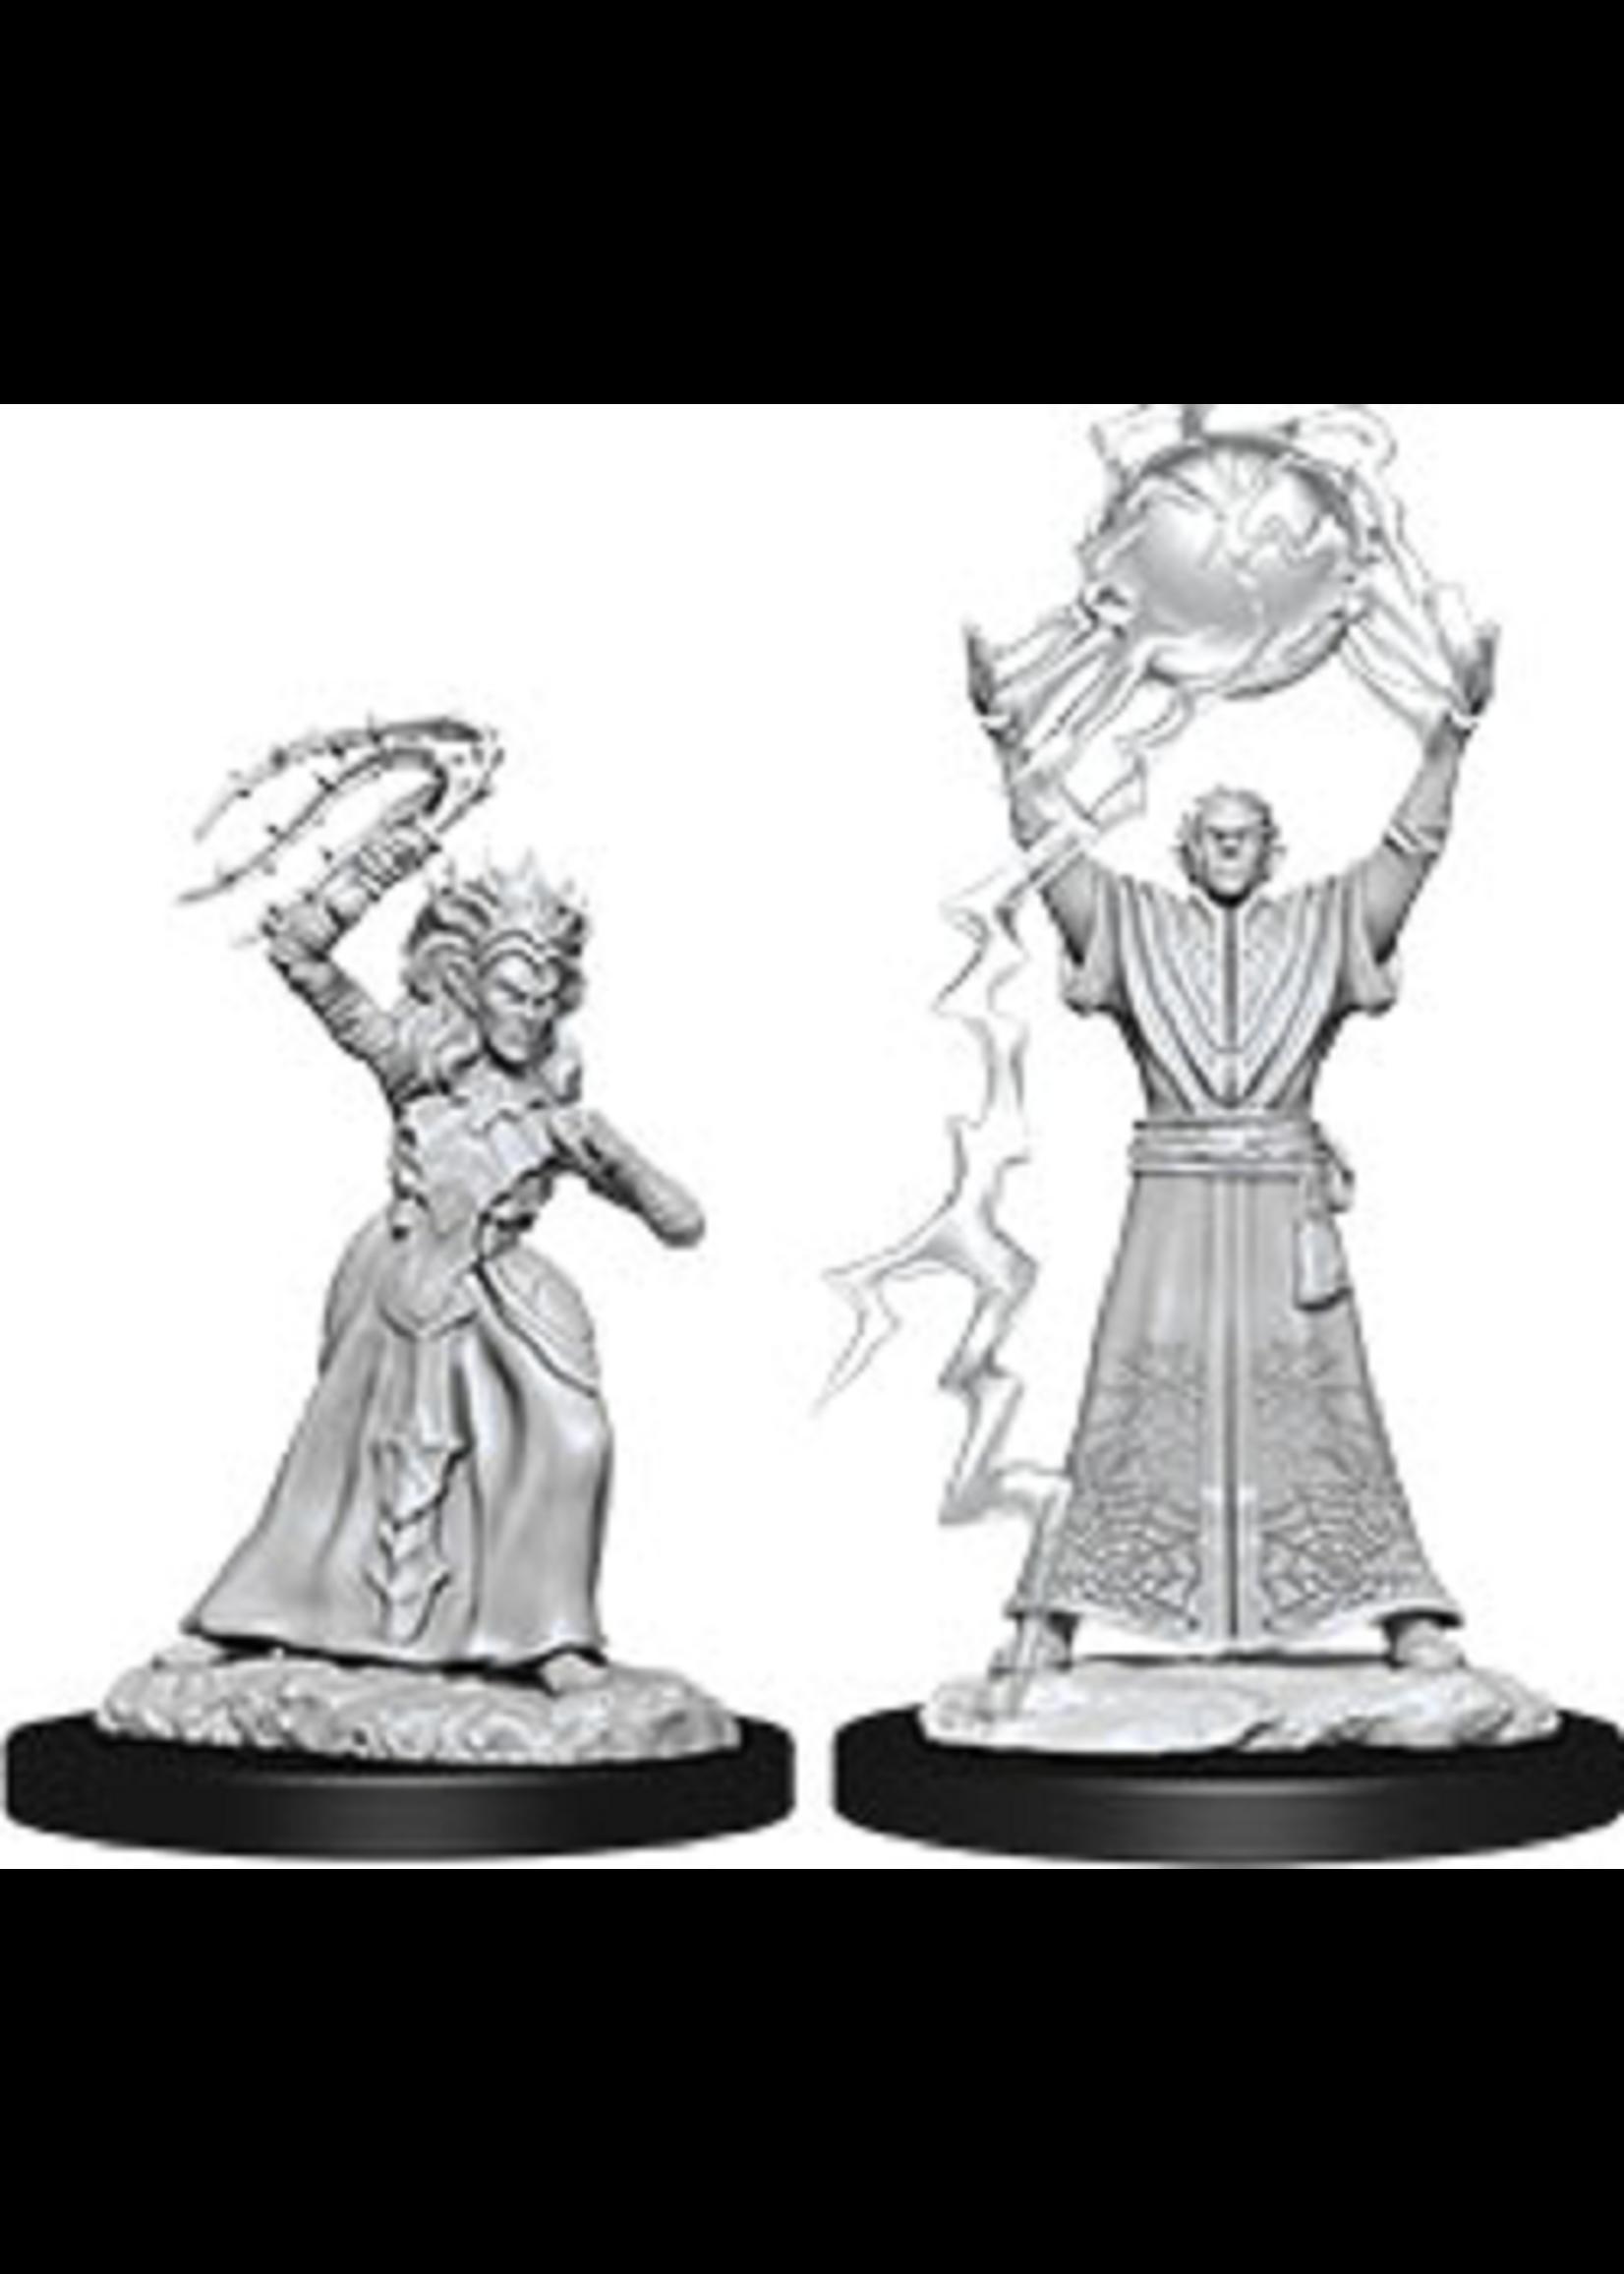 Dungeons & Dragons Nolzur`s Marvelous Unpainted Miniatures: W12 Drow Mage & Drow Priestess